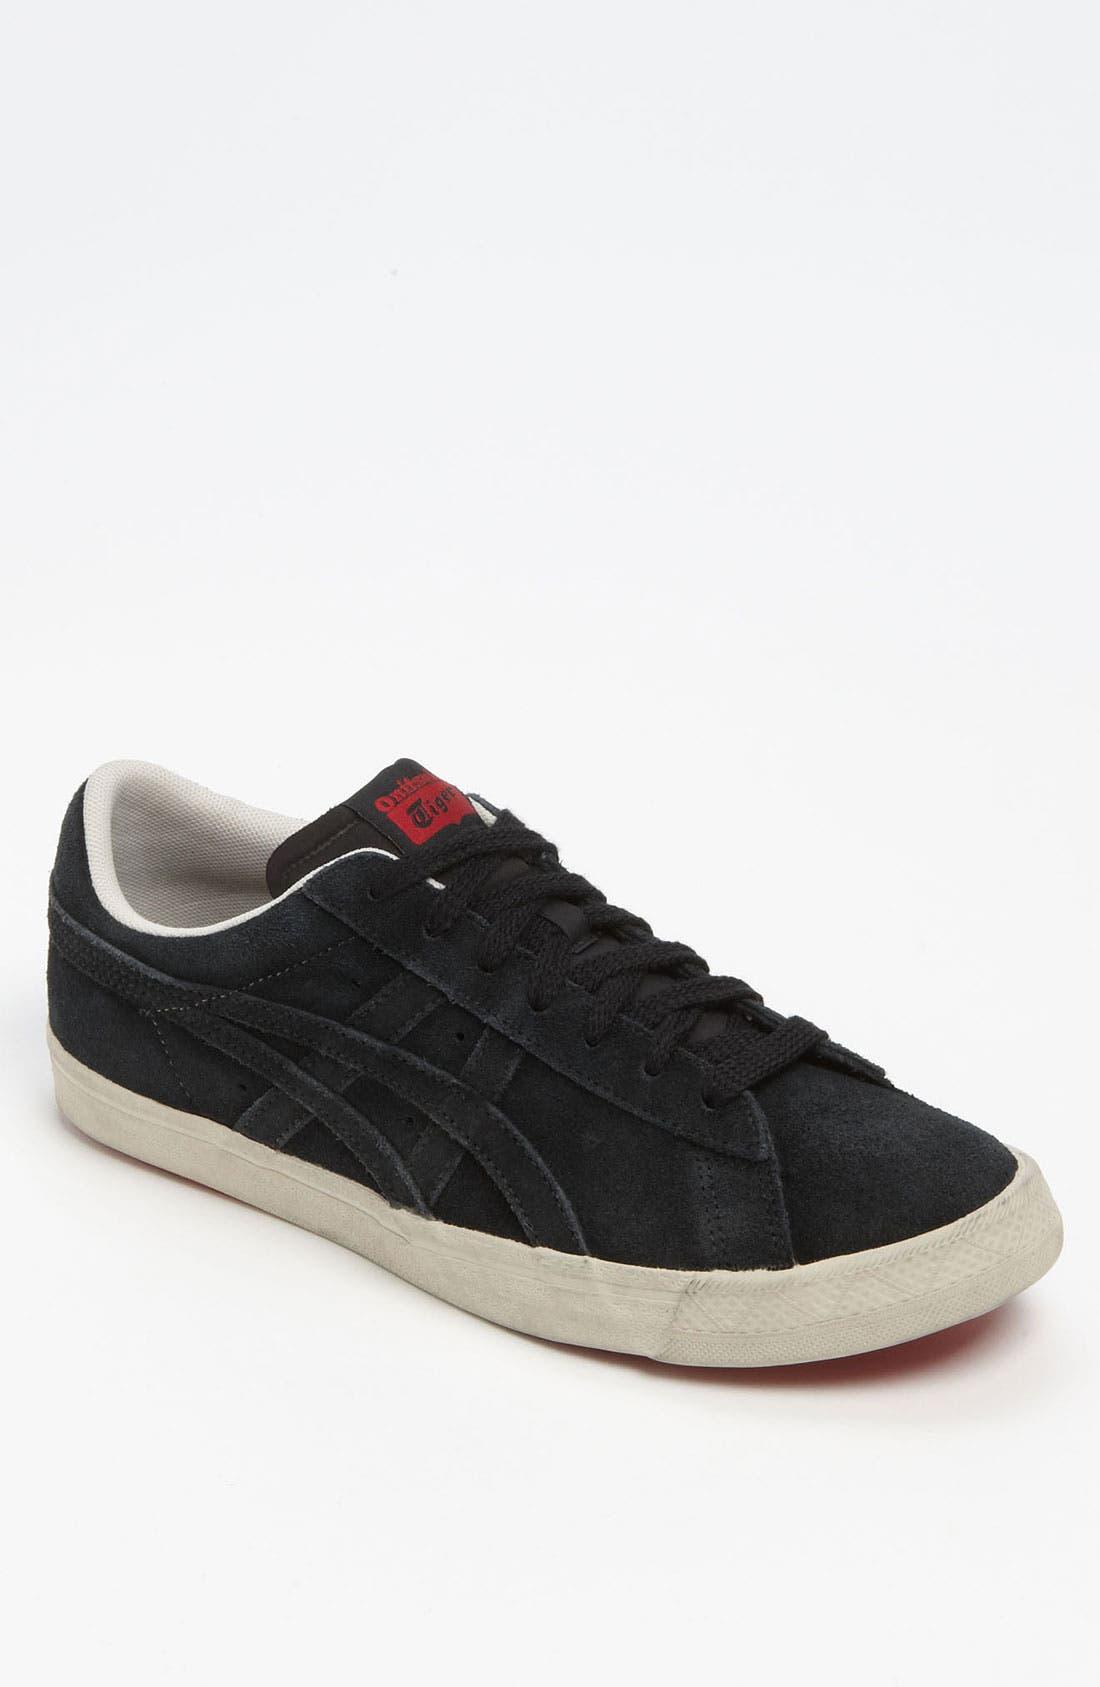 Alternate Image 1 Selected - Onitsuka Tiger™ 'Fabre BL-S' Sneaker (Men)